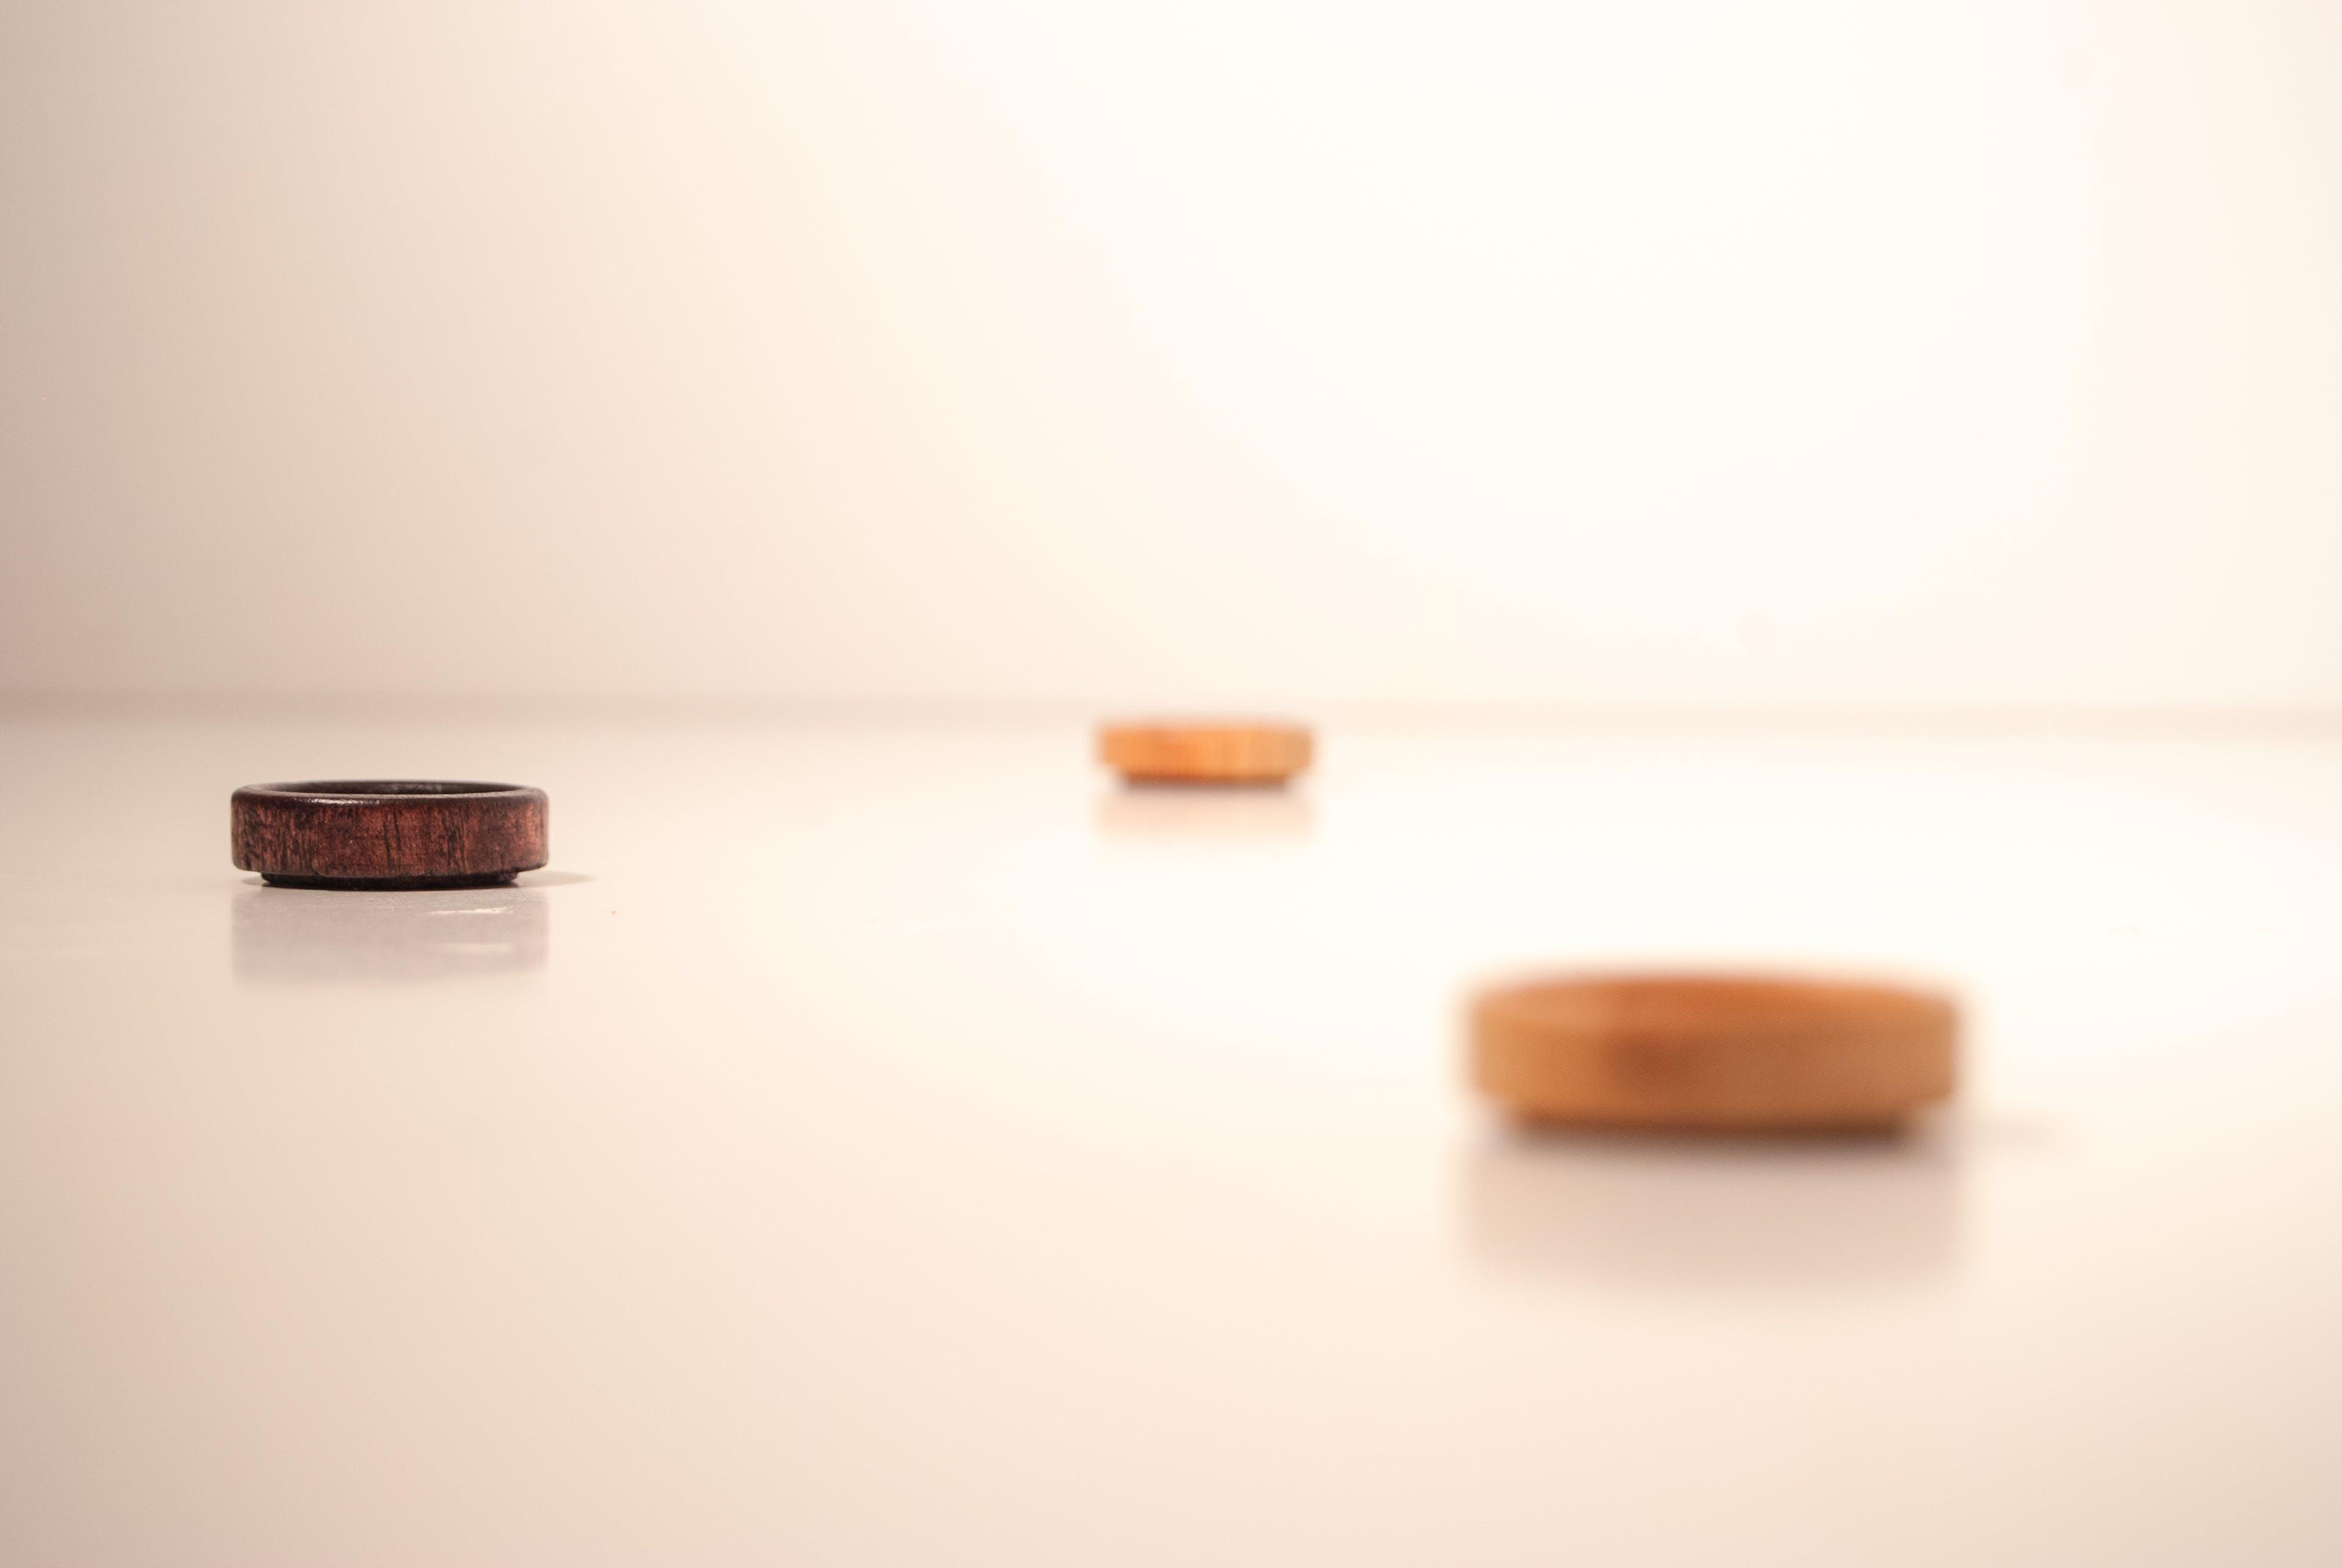 blur, close-up, cork lid